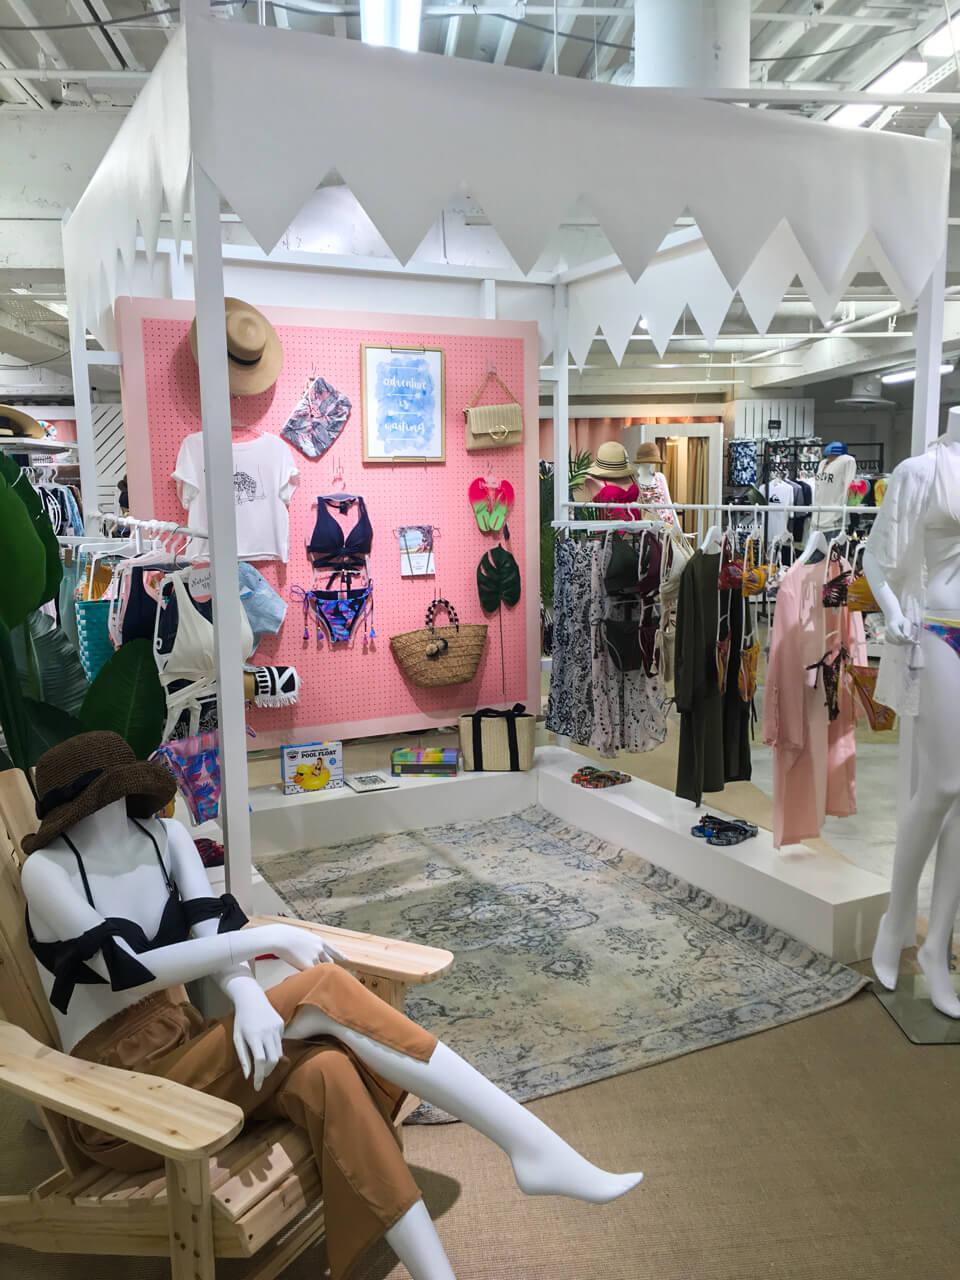 San-ai Resort 西武渋谷店モヴィーダ館